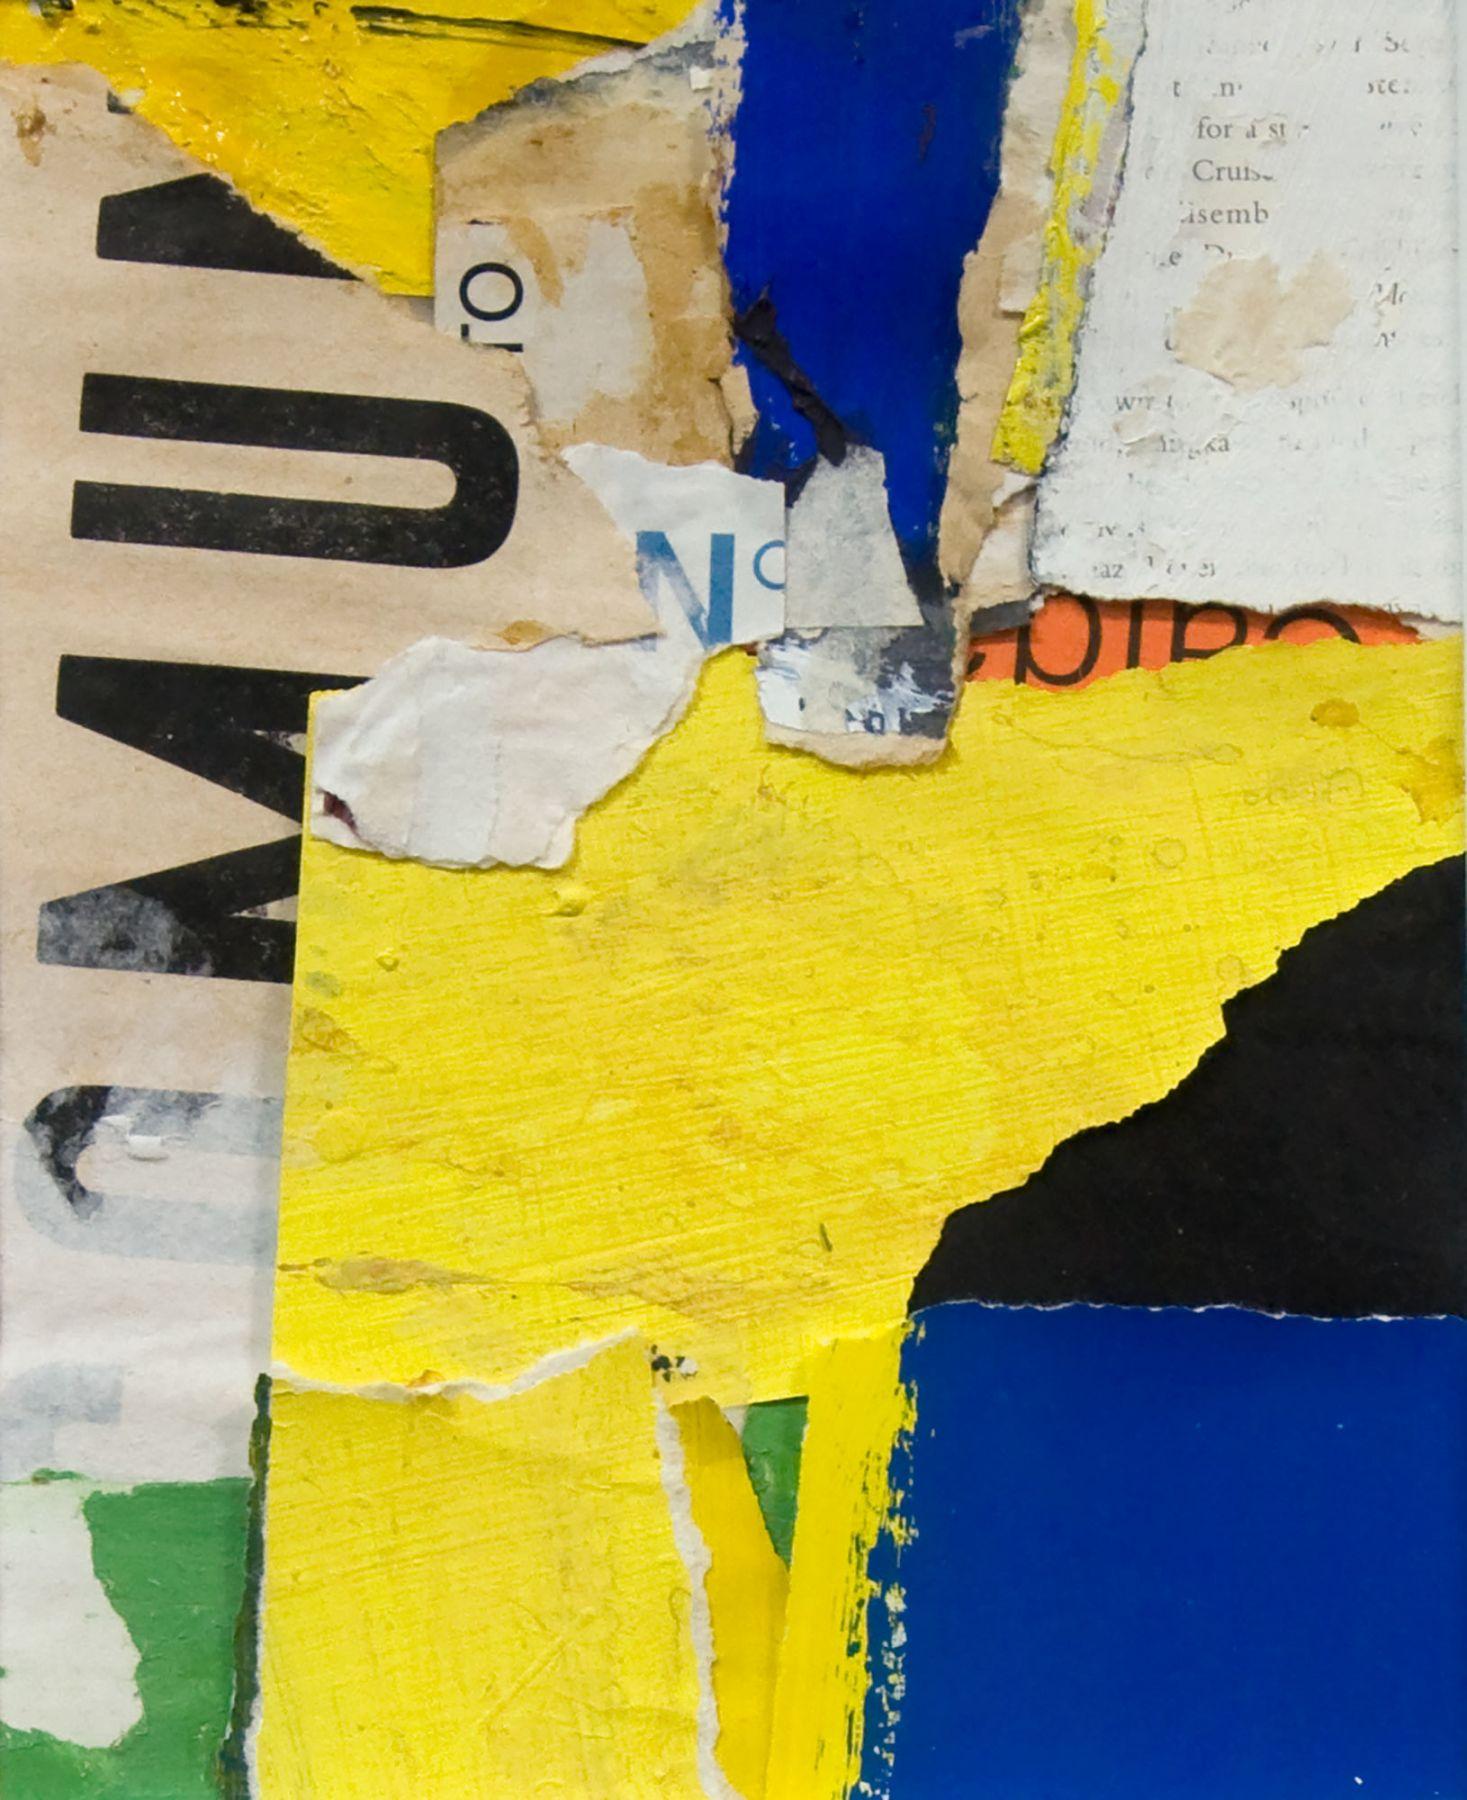 Frank Kirk, Untitled, 2017